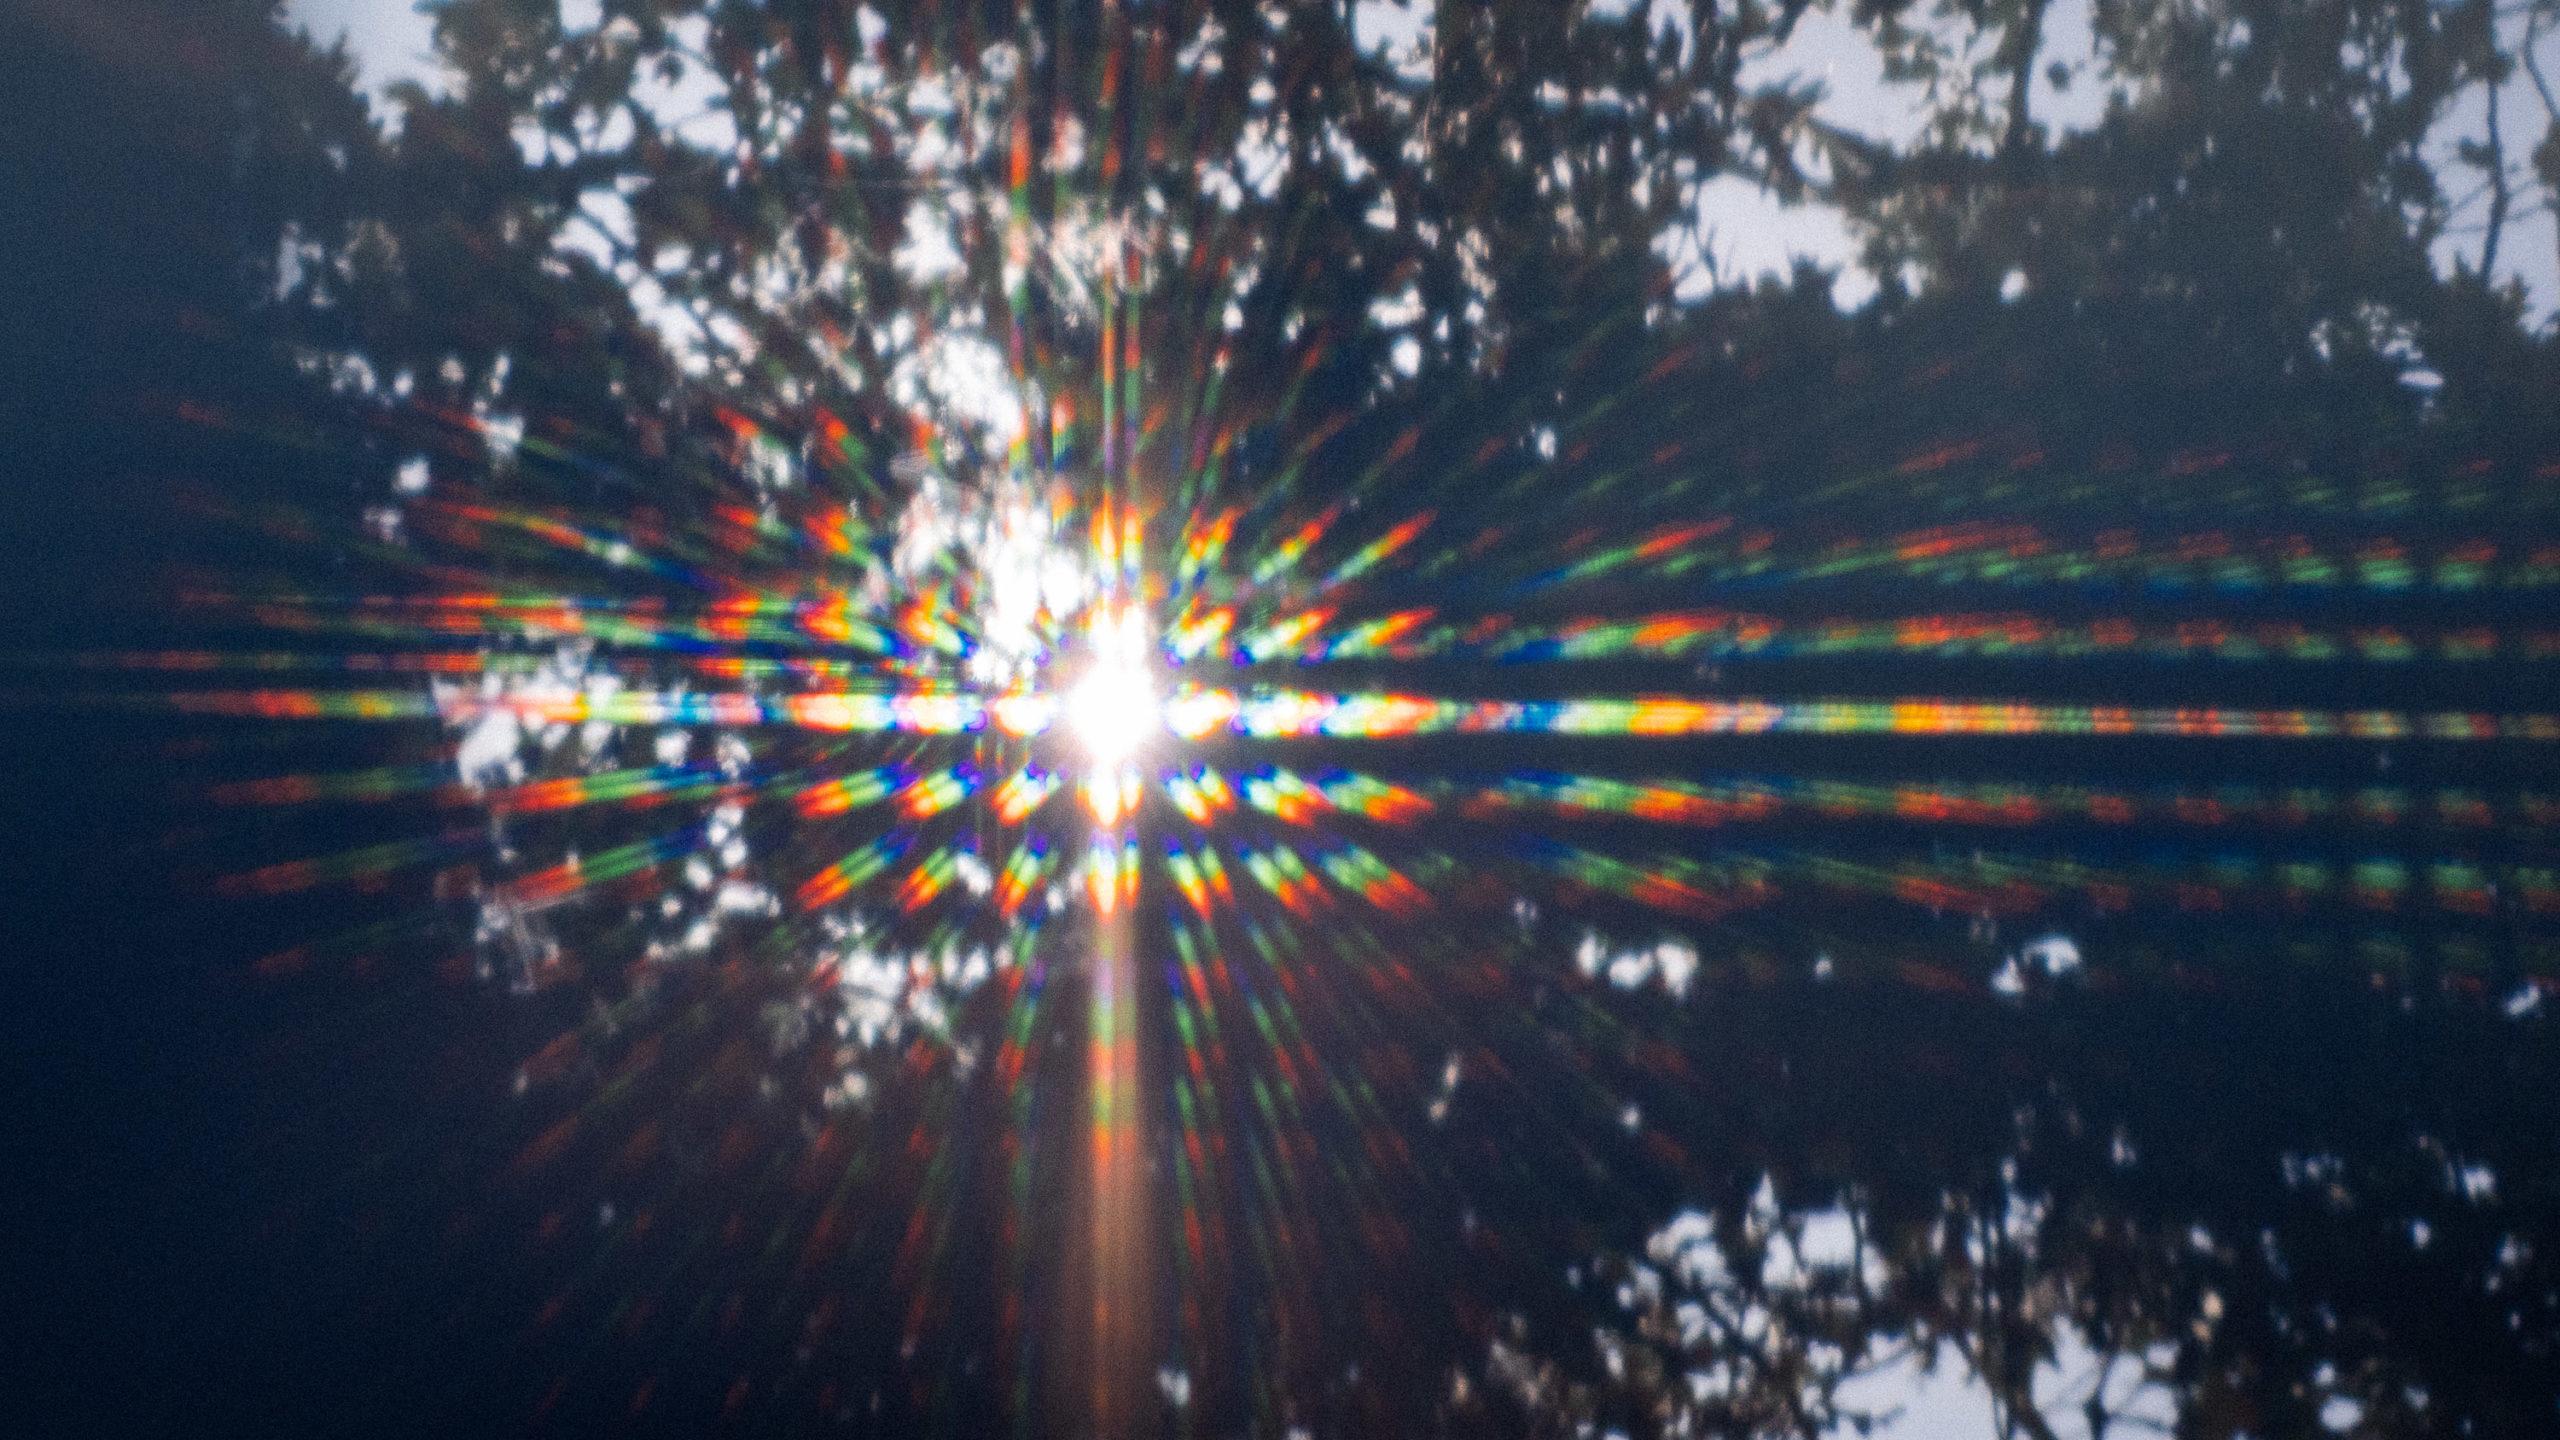 refracted light creates a sunburst of rainbows on a laptop screen